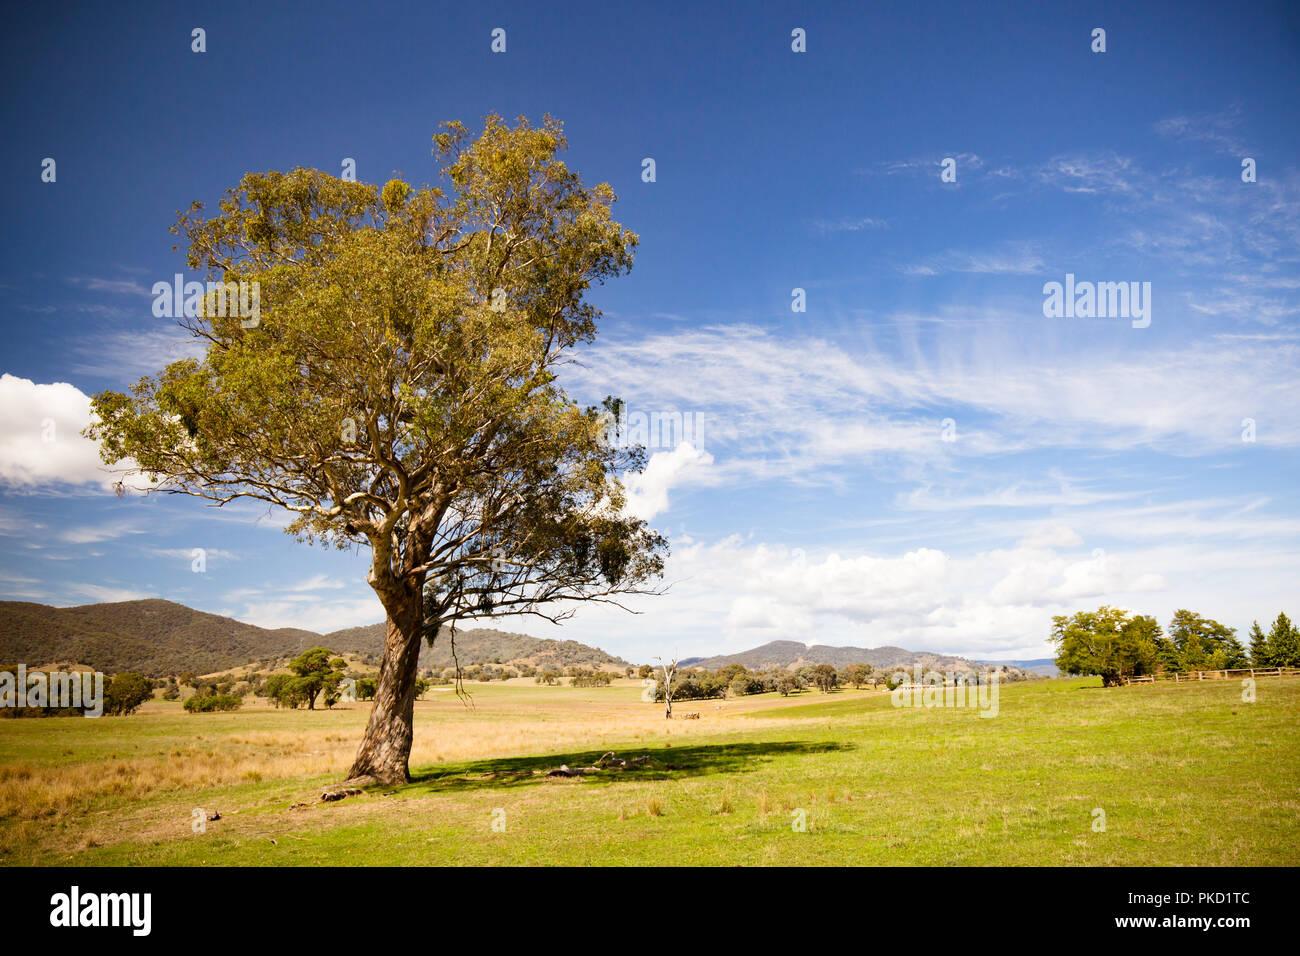 Allans flache Landschaft Australien Stockfoto